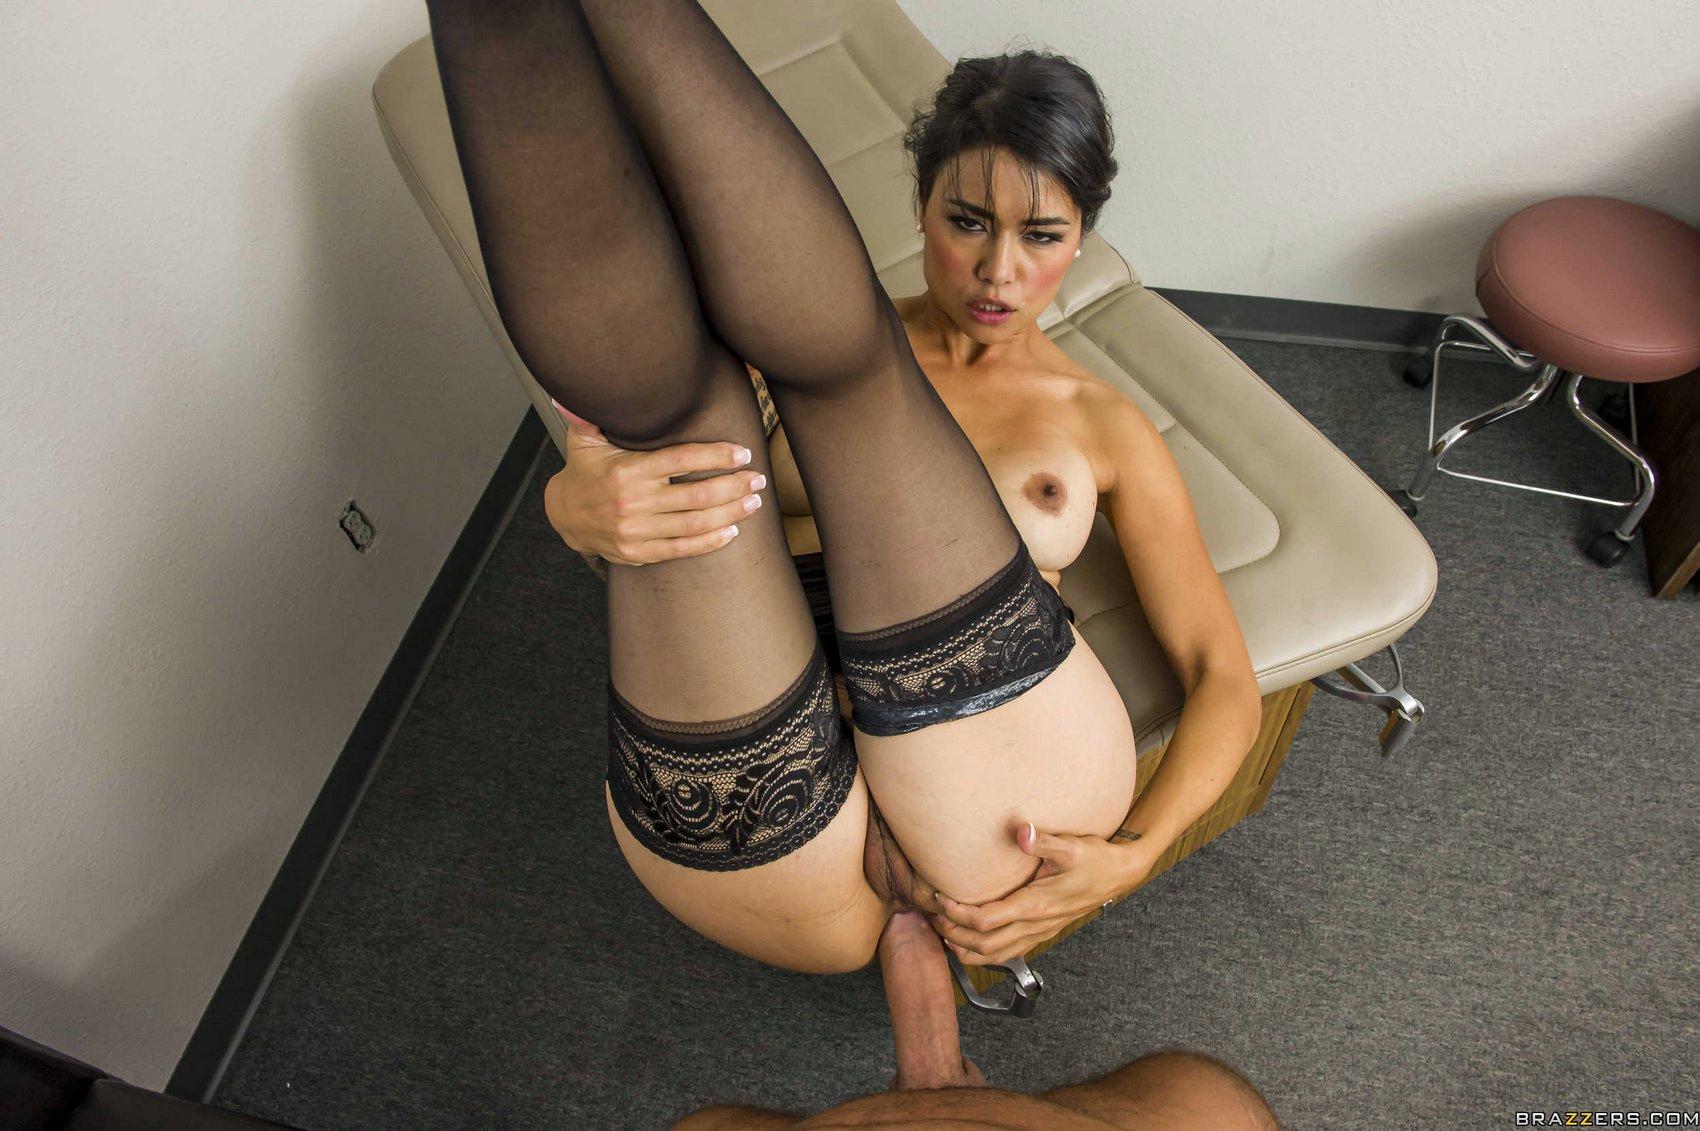 Dana vespoli anal and blowjob cum | Adult fotos)